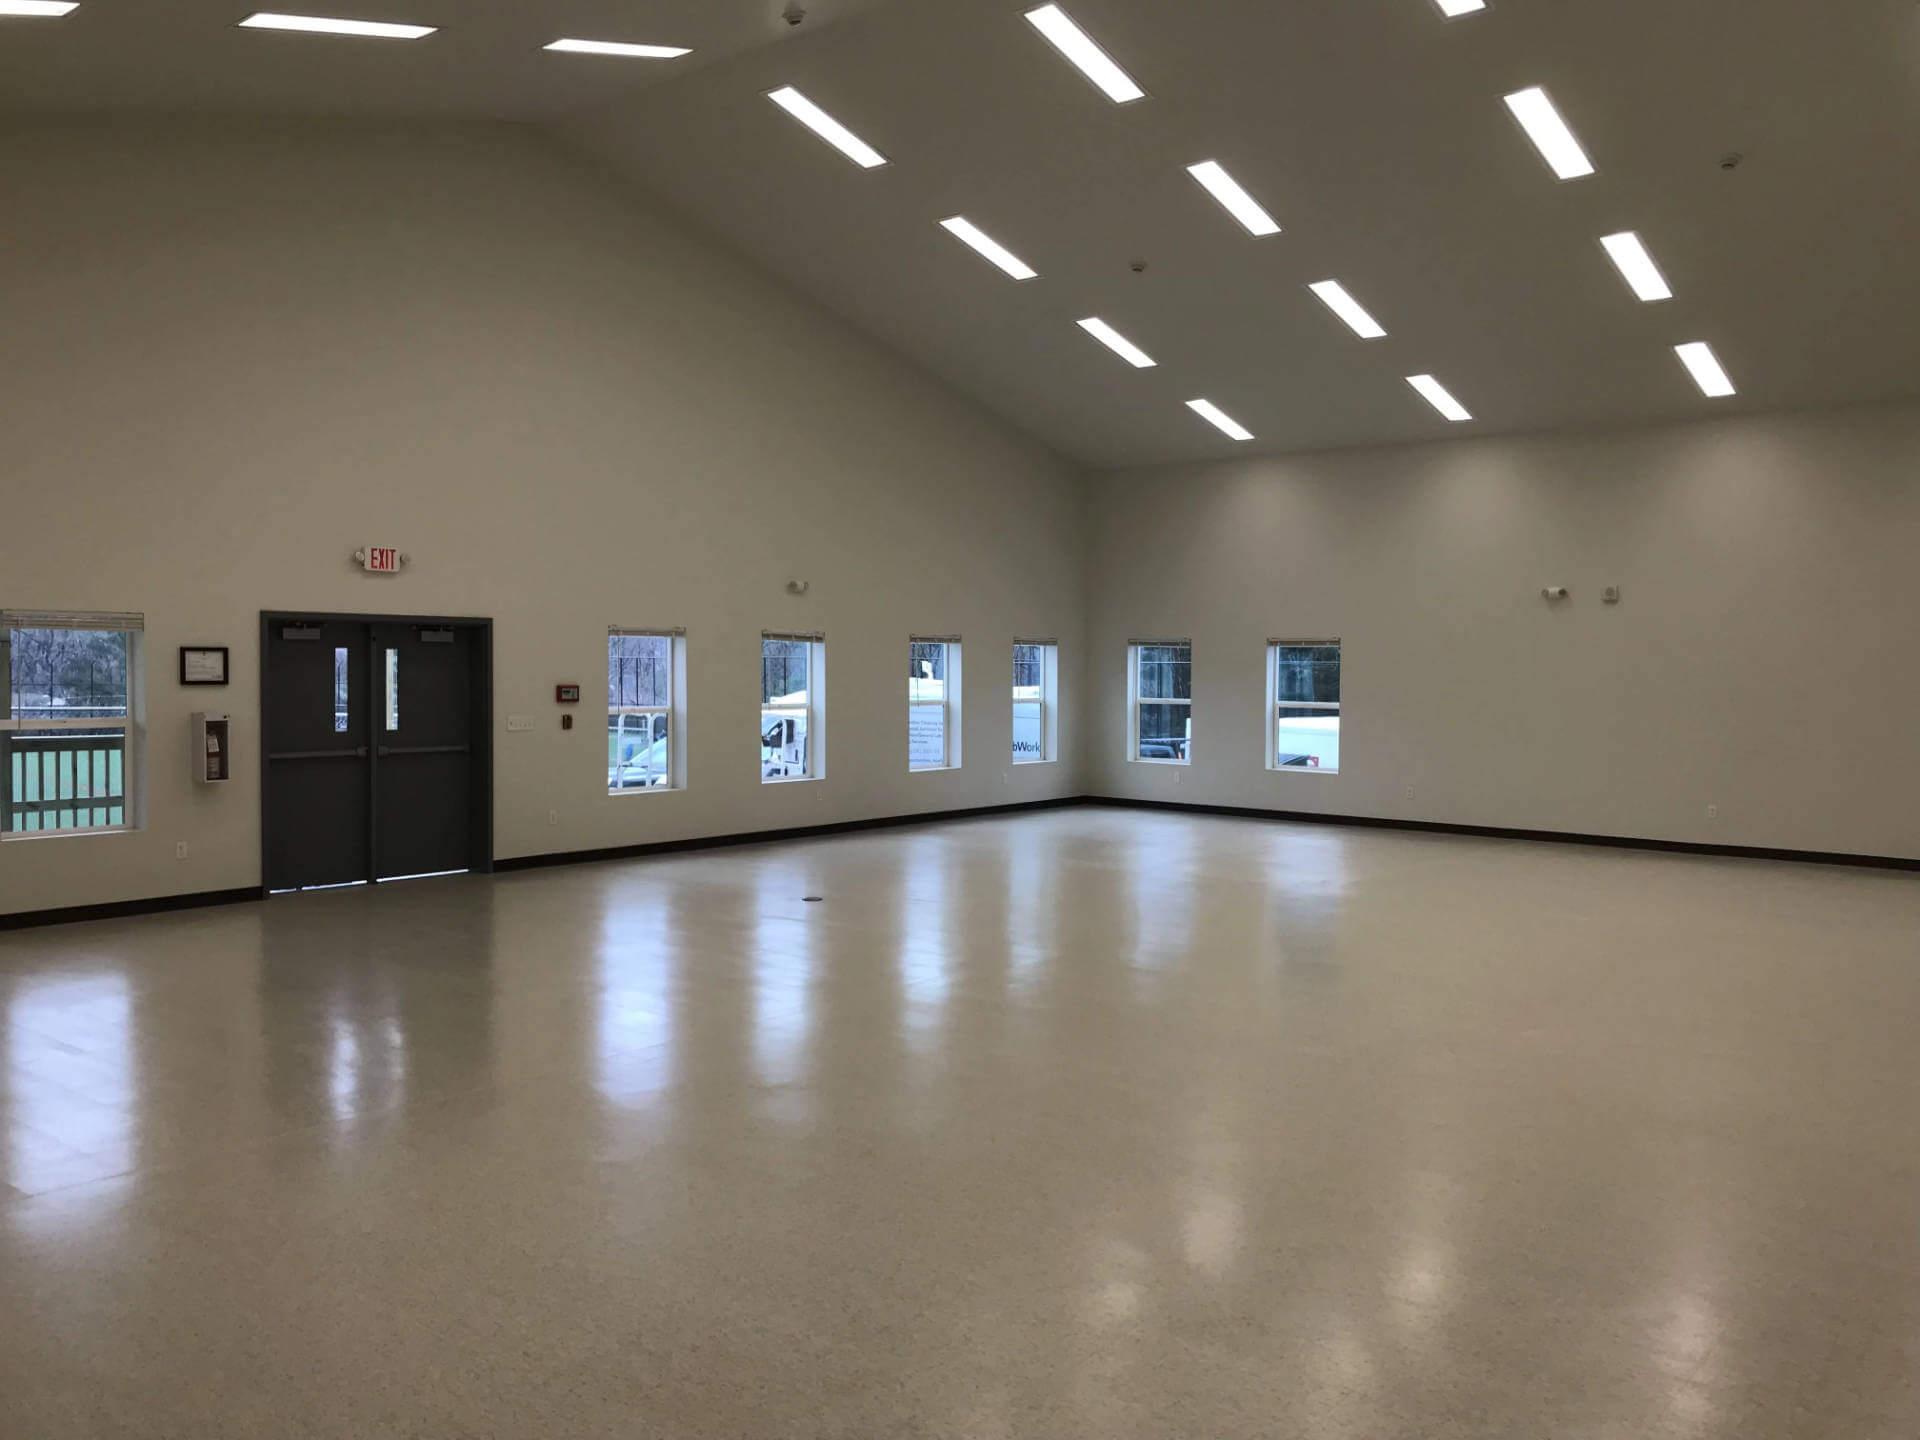 Heights School Interior 1-1-1